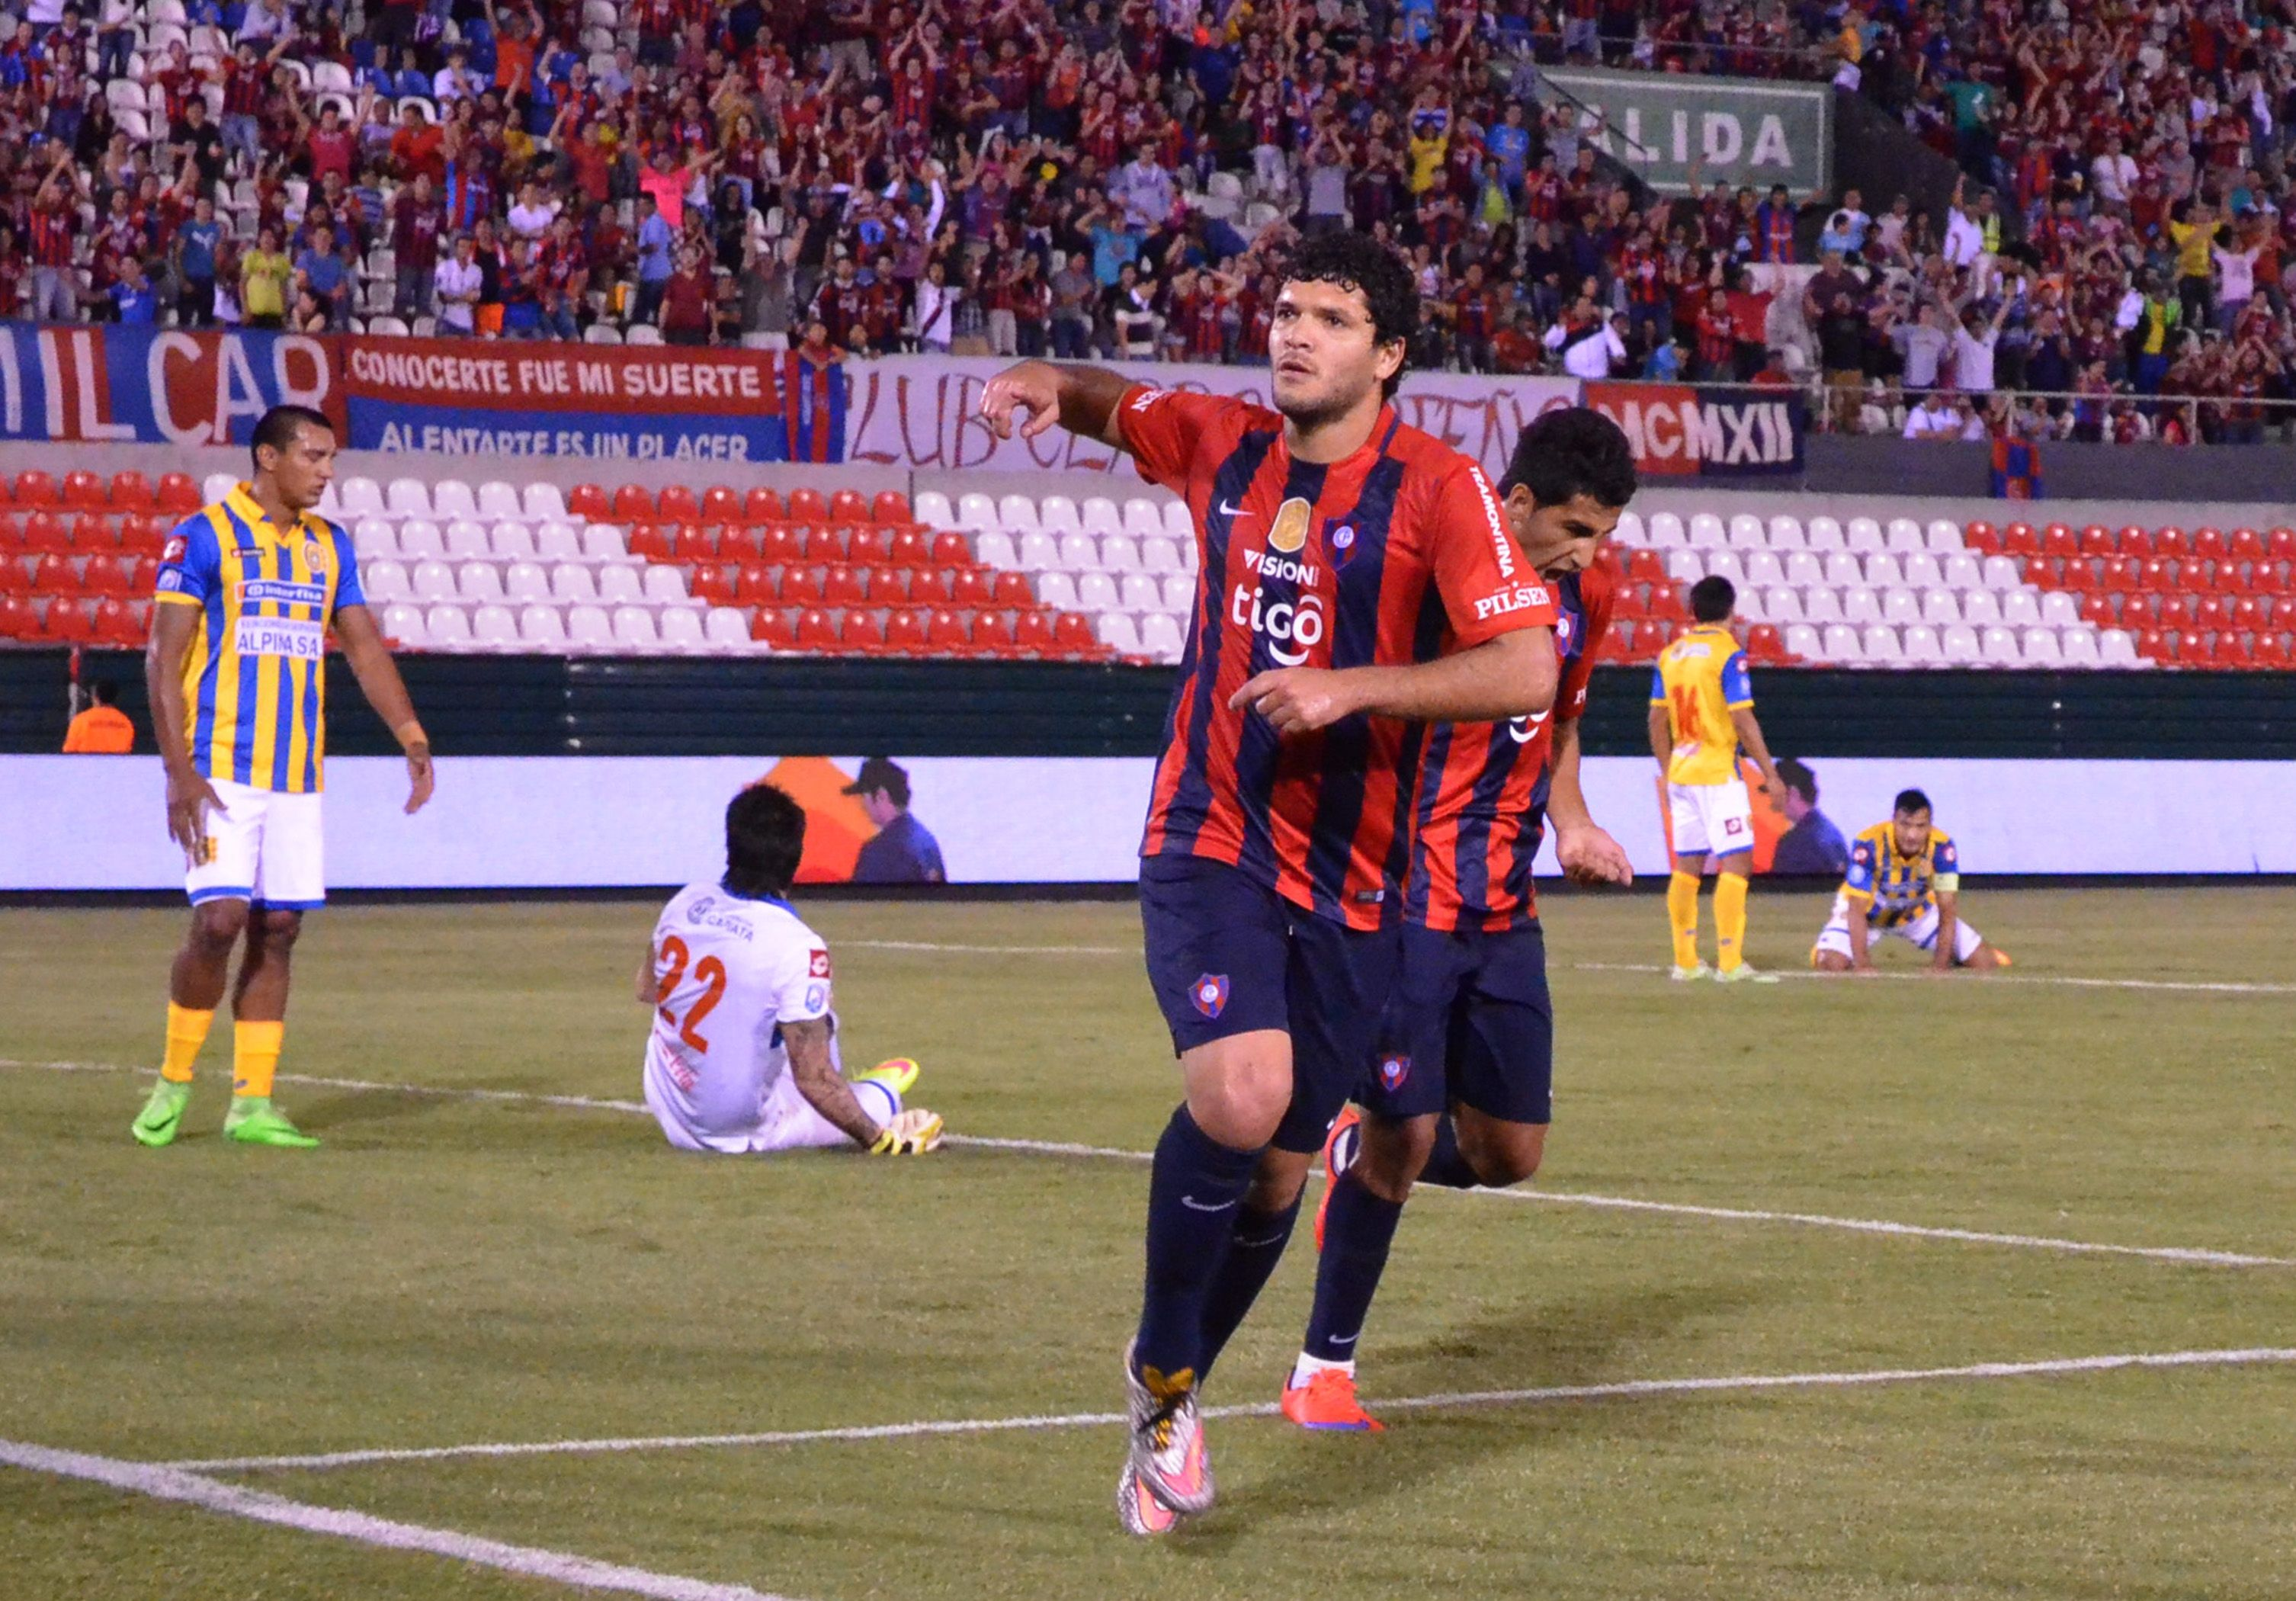 Ortigoza guardará sus goles para retornar en la fecha 16. Foto: Rubén Alfonso - Última Hora.